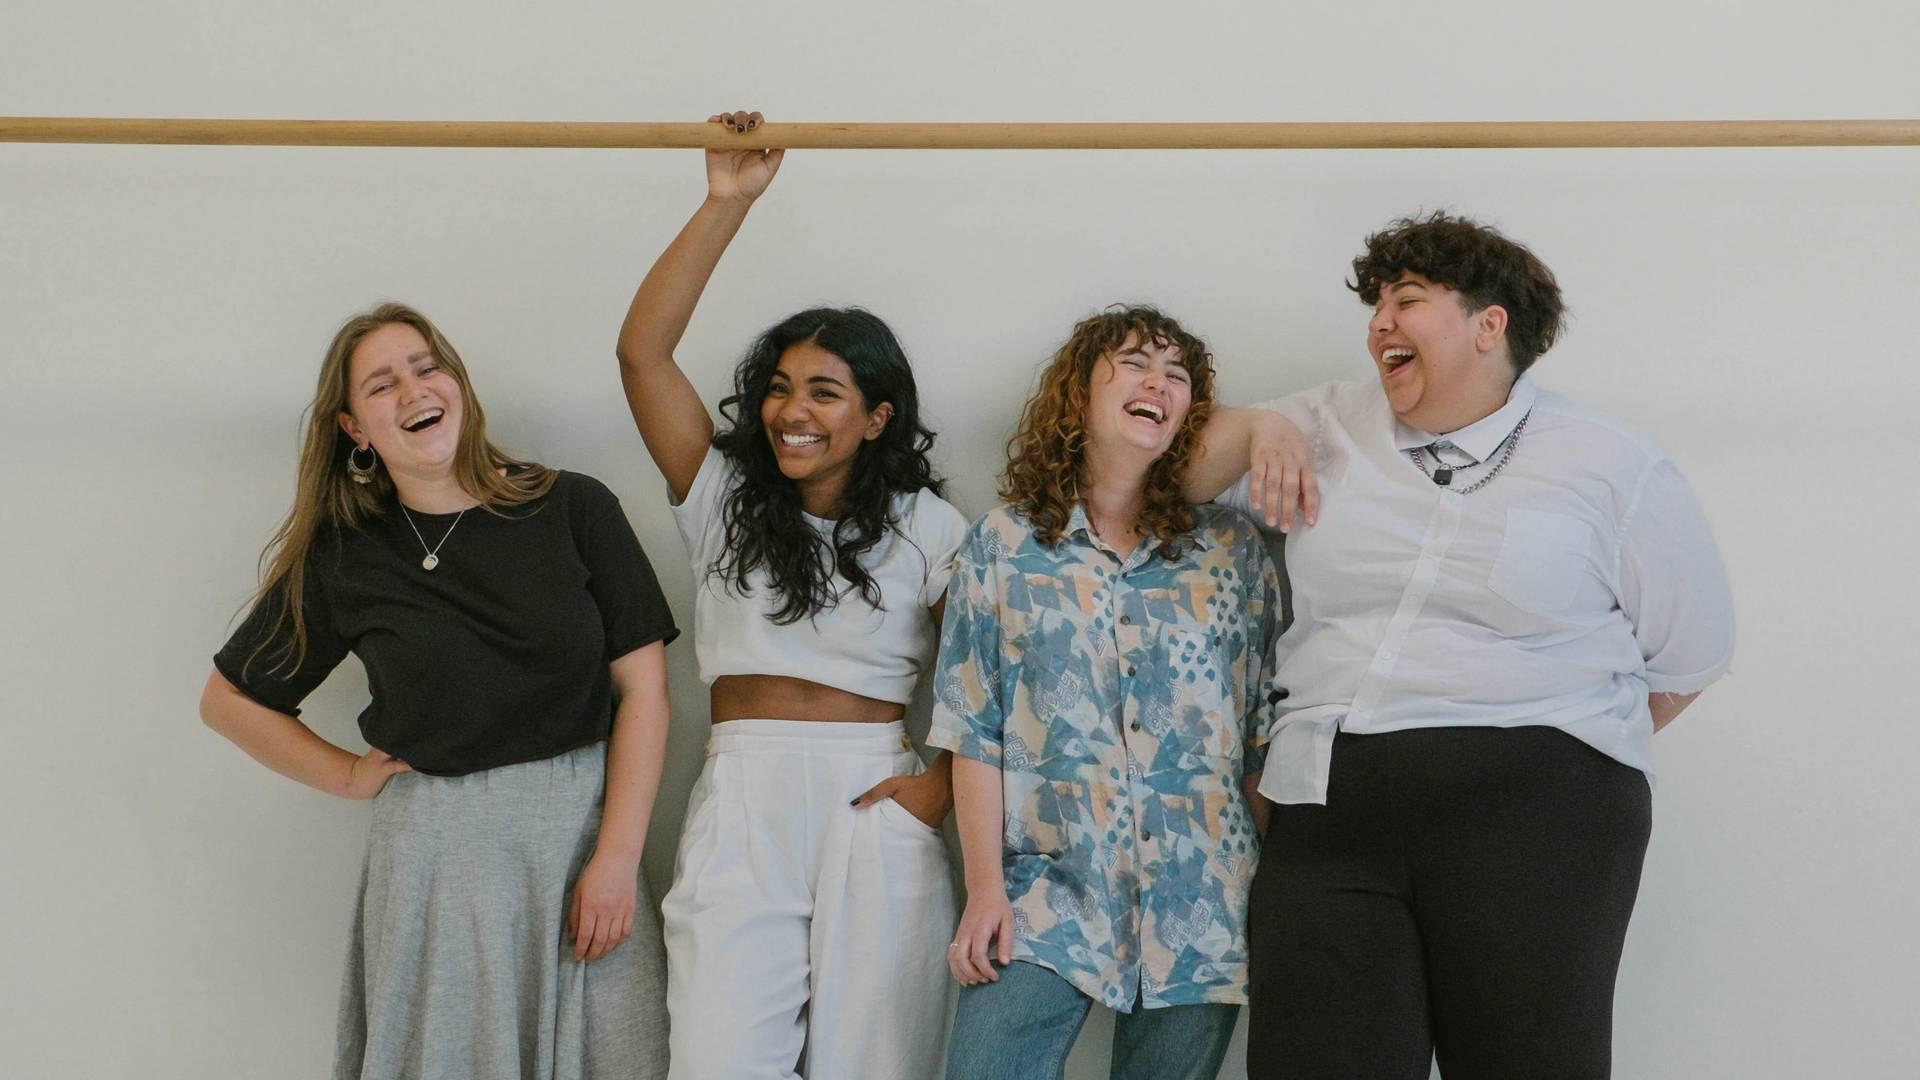 Erwachsene freunde sex dating arizona 2020